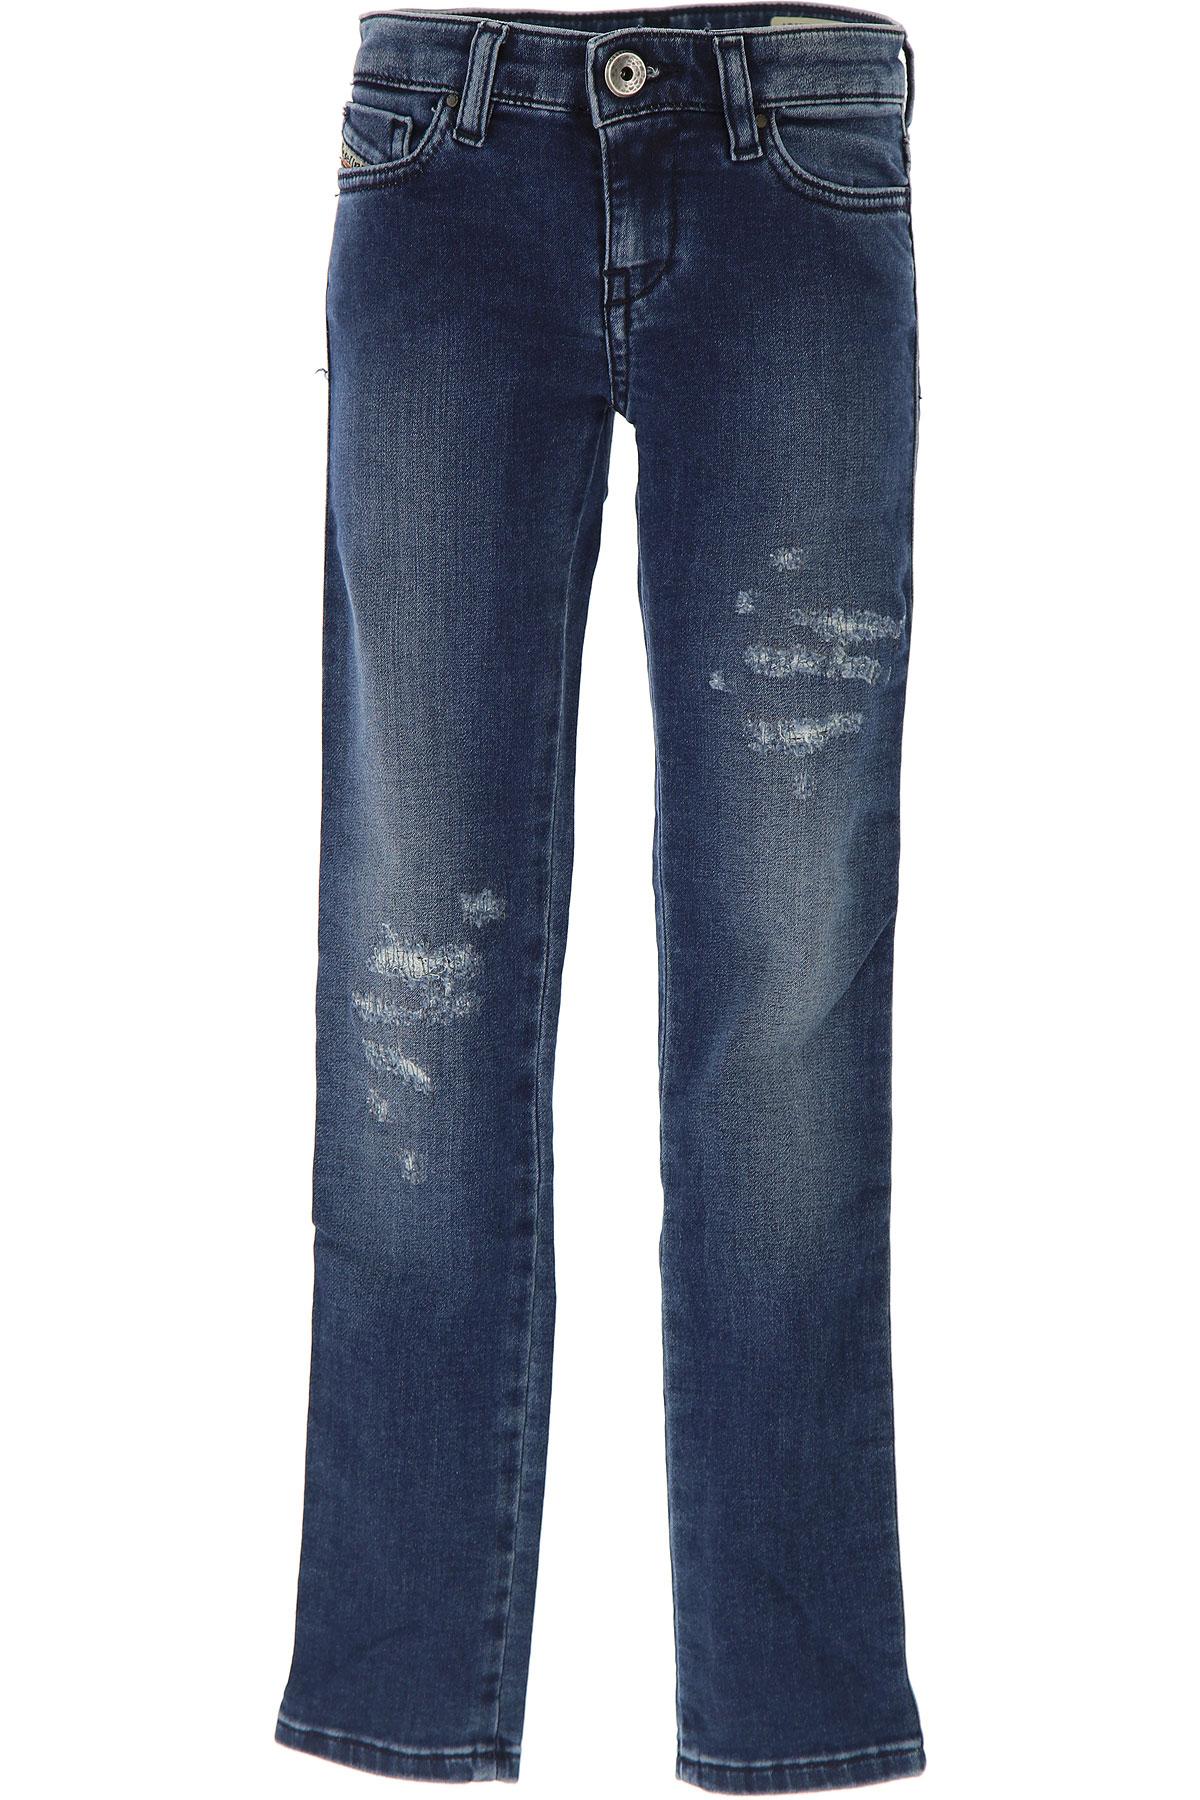 Image of Diesel Kids Jeans for Girls On Sale in Outlet, Blue Denim, Cotton, 2017, 10Y 14Y 8Y